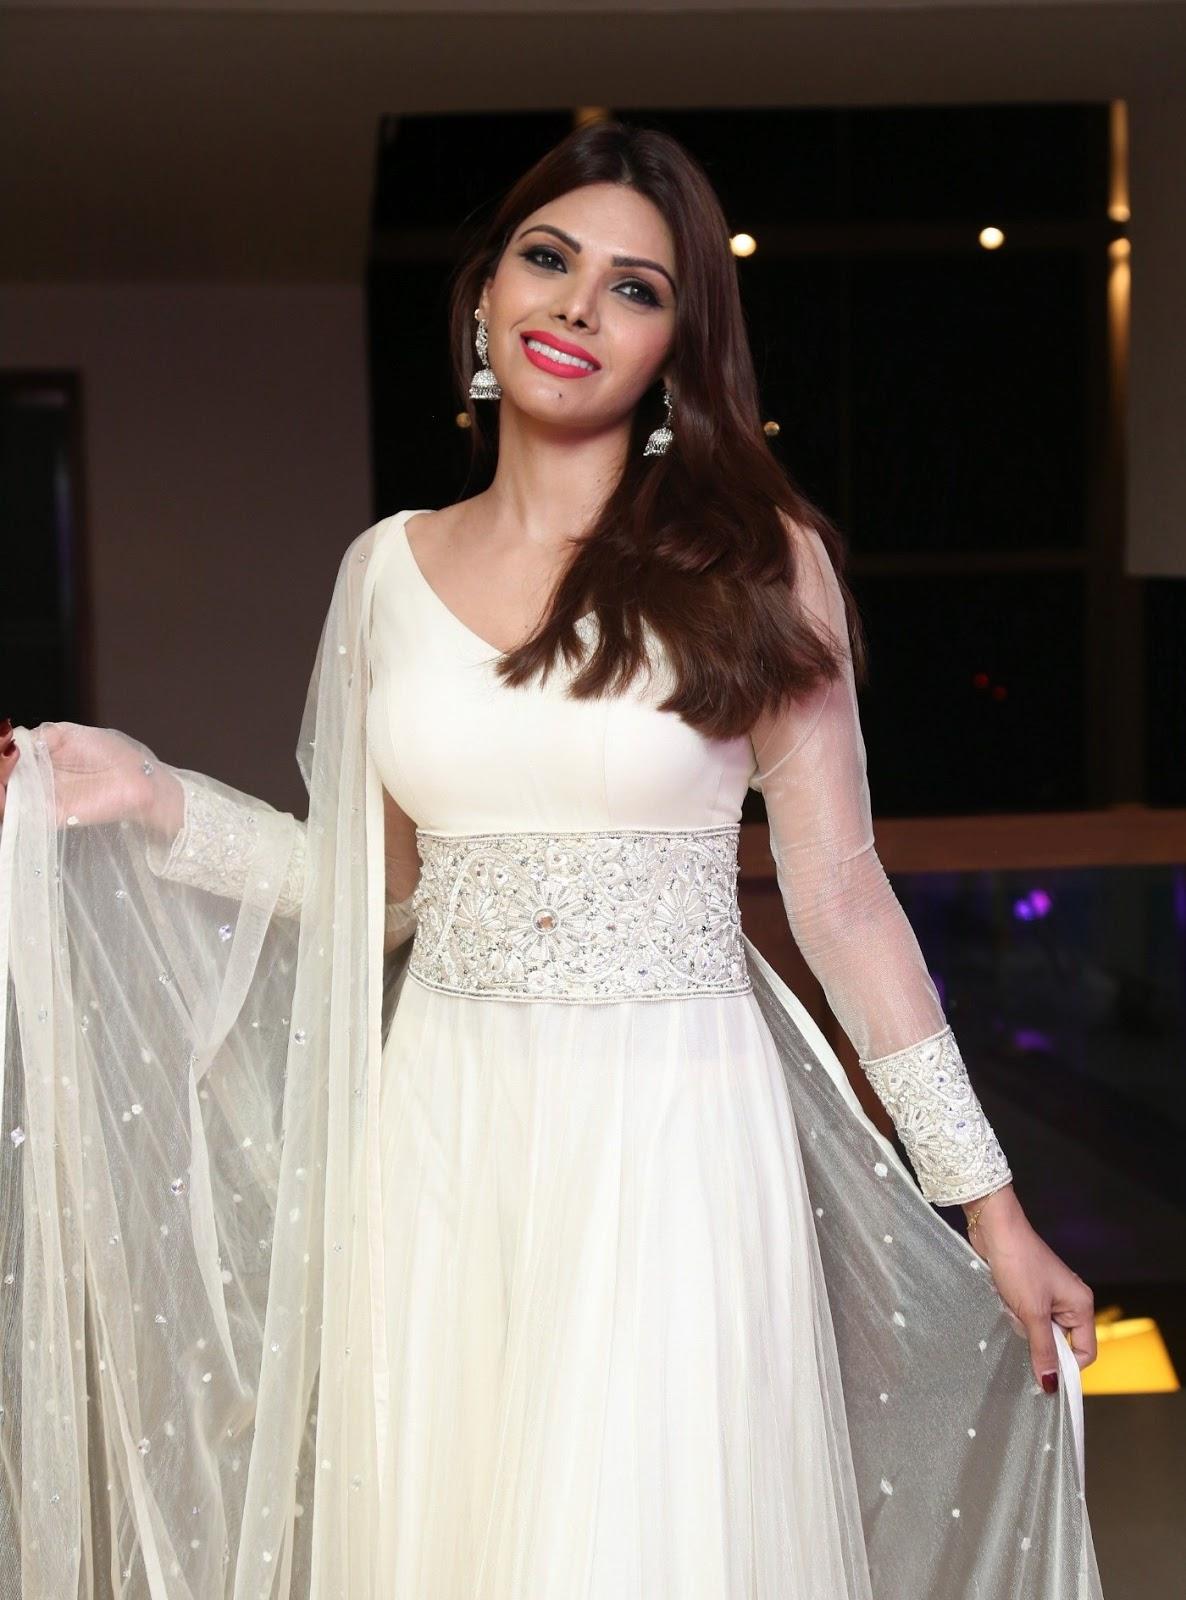 Sherlyn Chopra Looks Super Hot In White Dress At Dj Inayah -5202